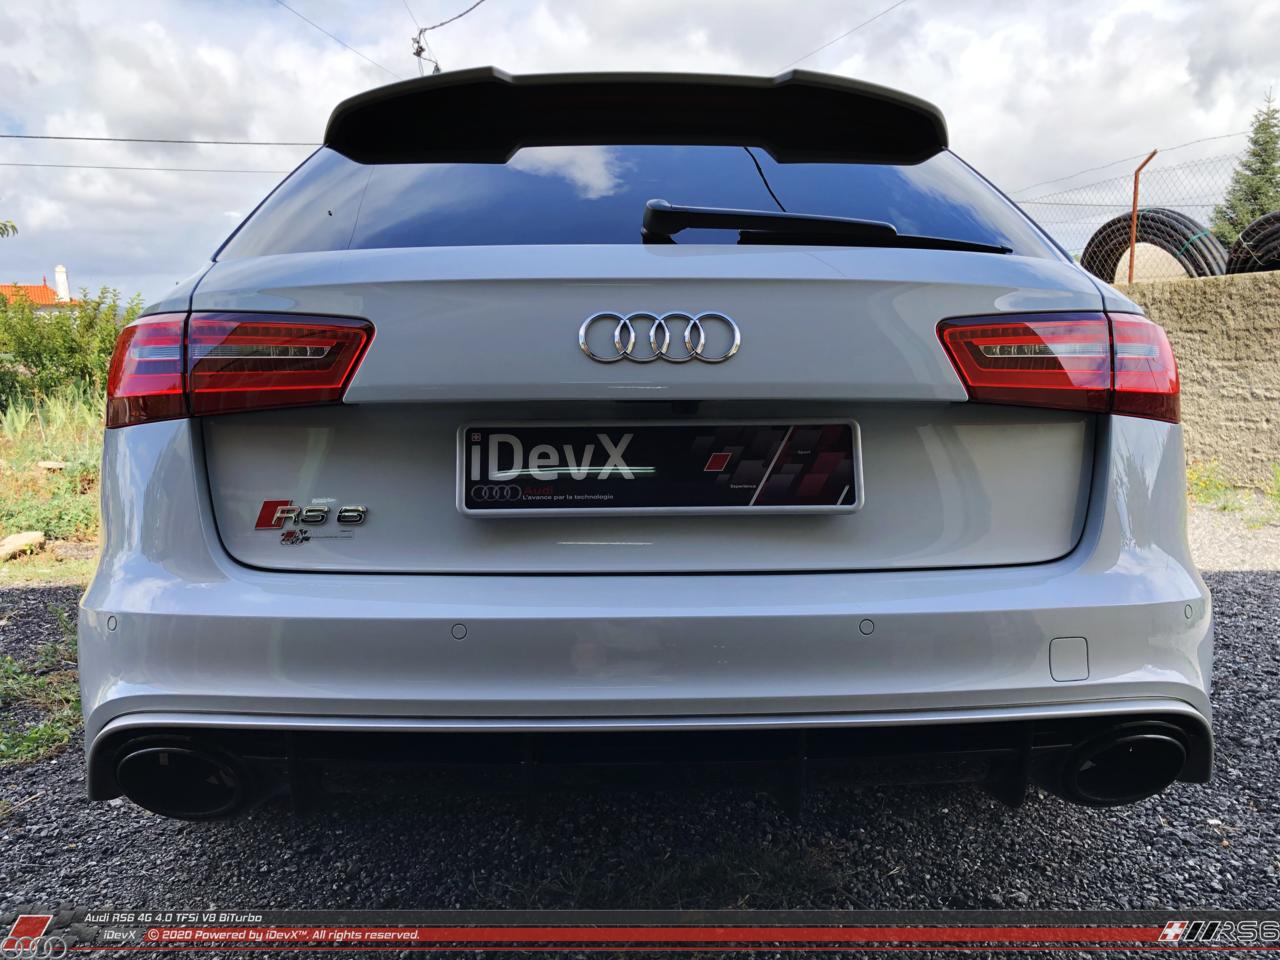 05_08.2019_Audi-RS6_iDevX_046.png